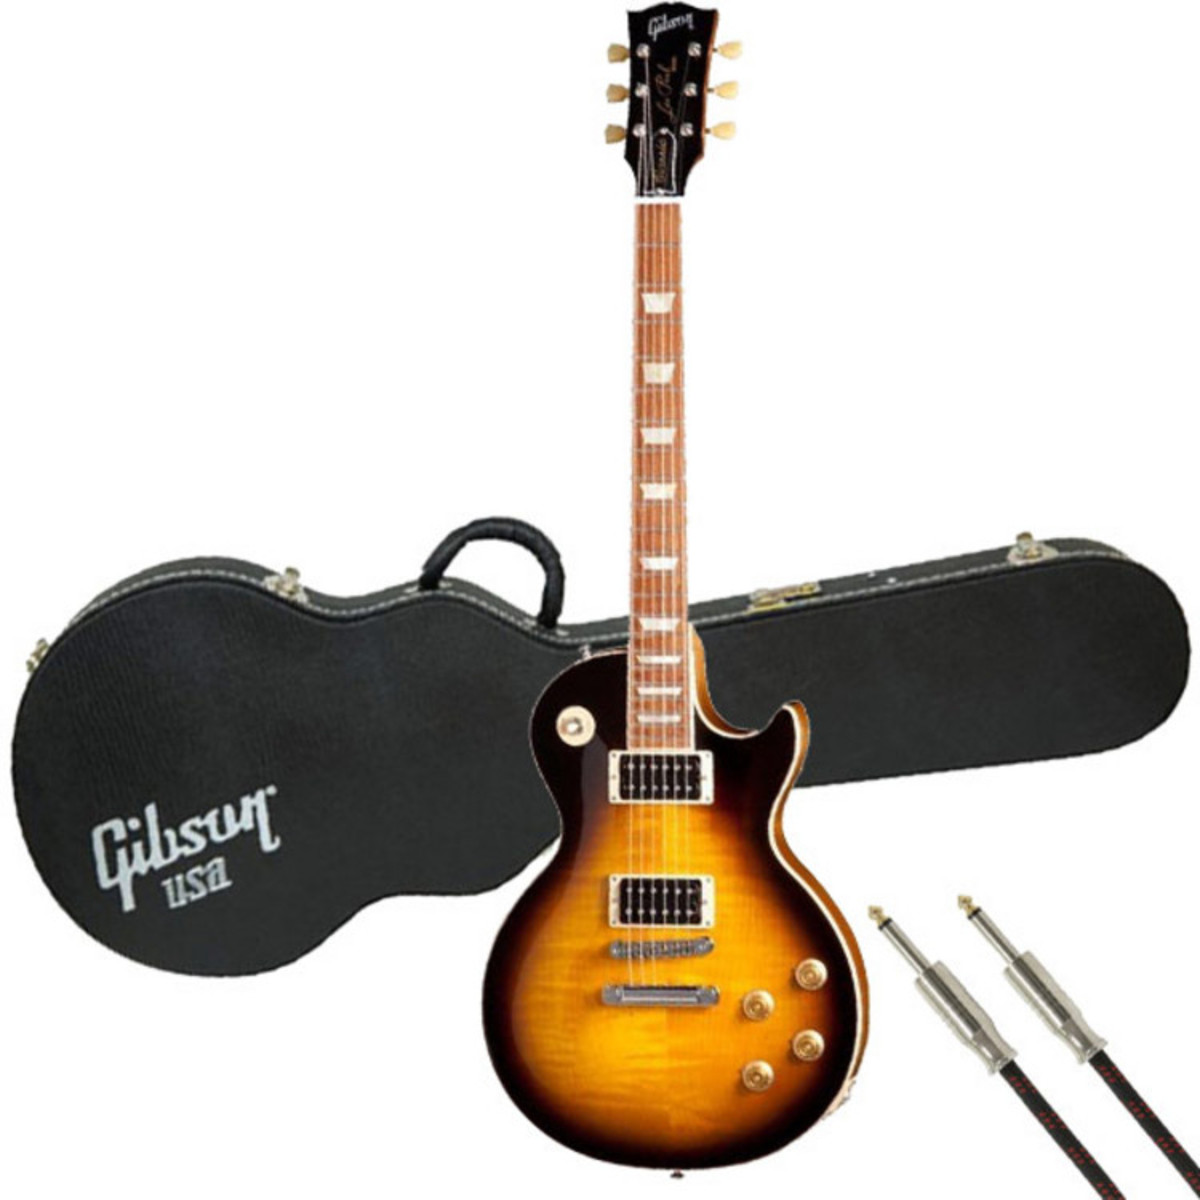 Gibson Les Paul Studio 2018 Vintage Sunburst -